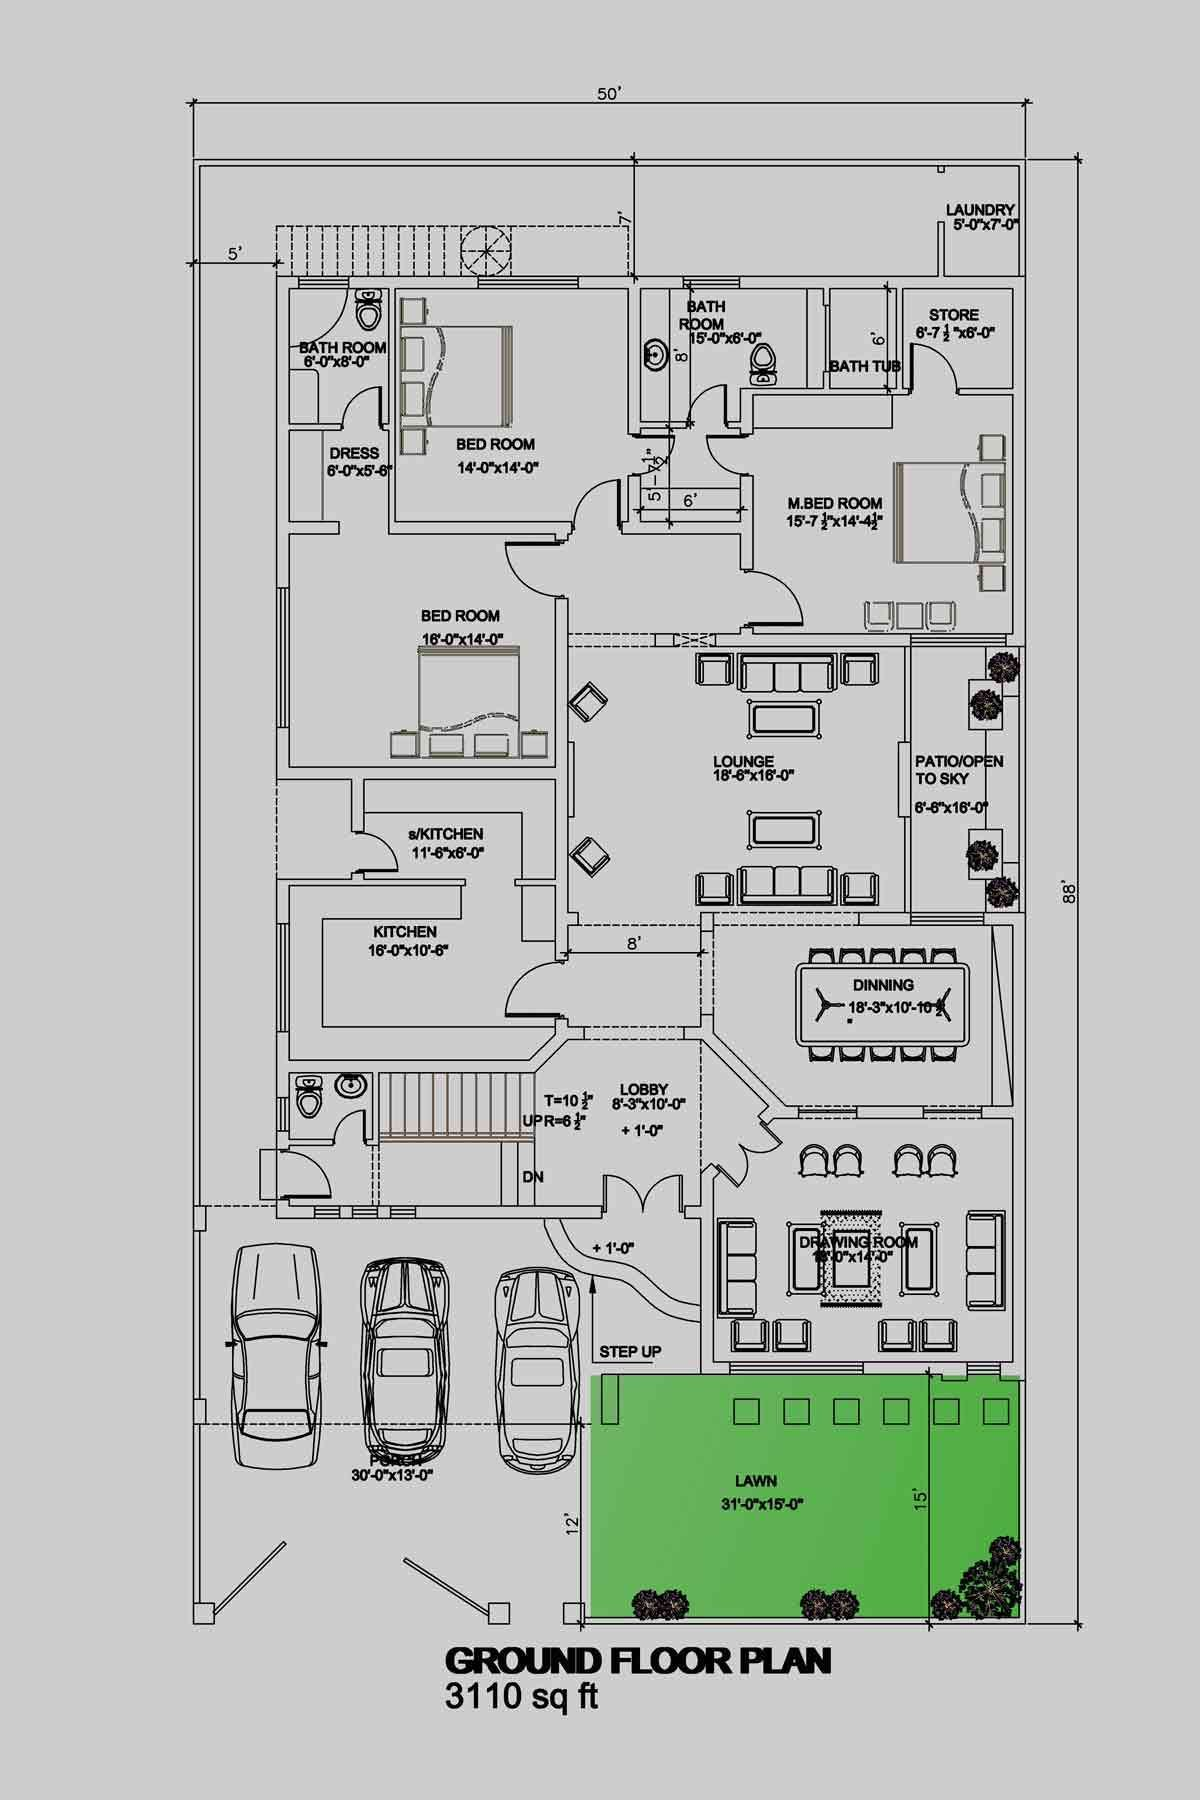 House Floor Plan House Layout Plans Floor Plans Best House Plans